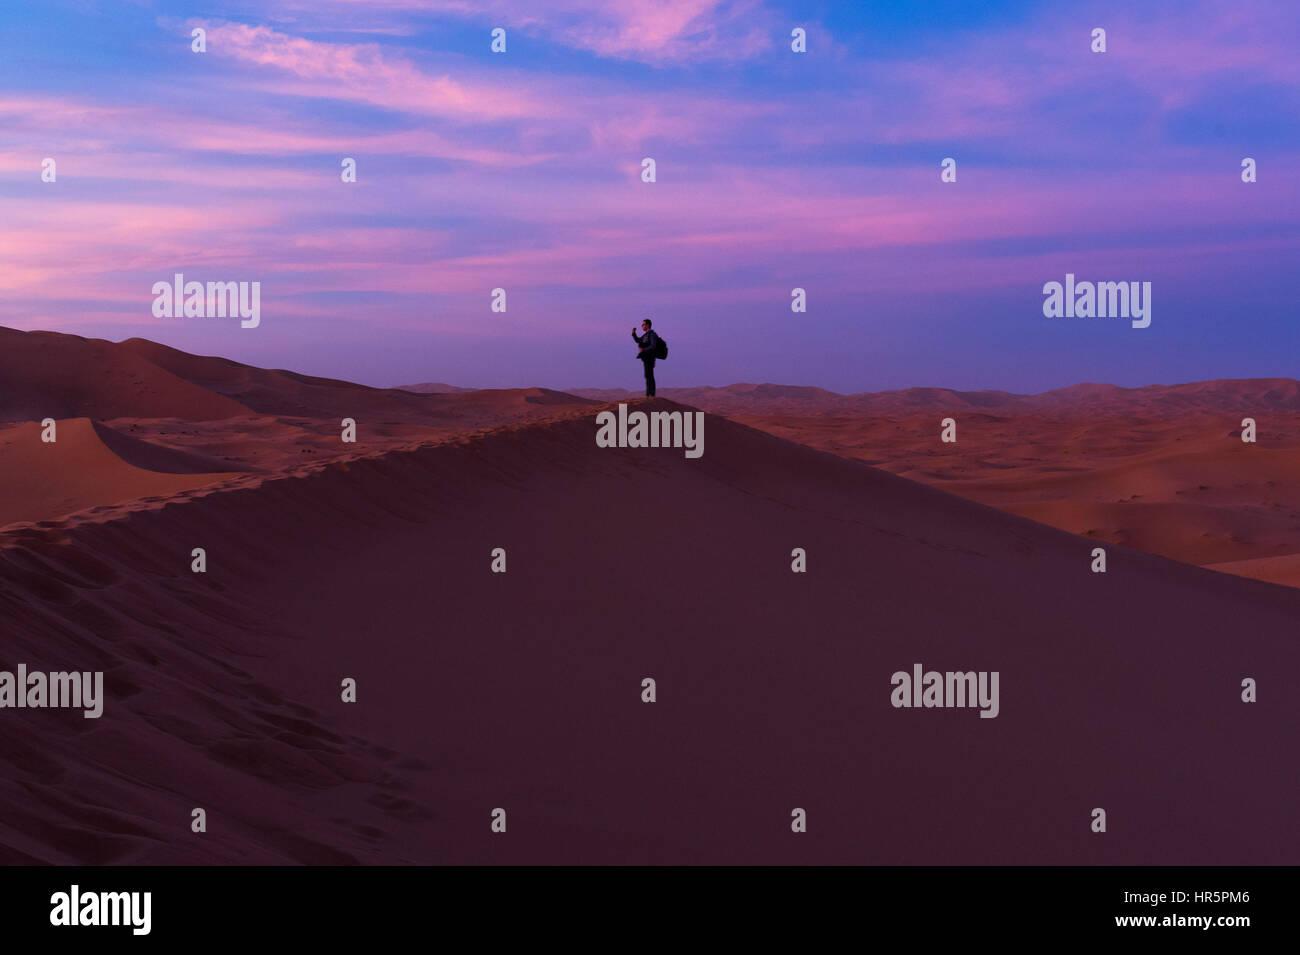 Tourist standing alone on one dune in Sahara Desert during Sunset - Stock Image